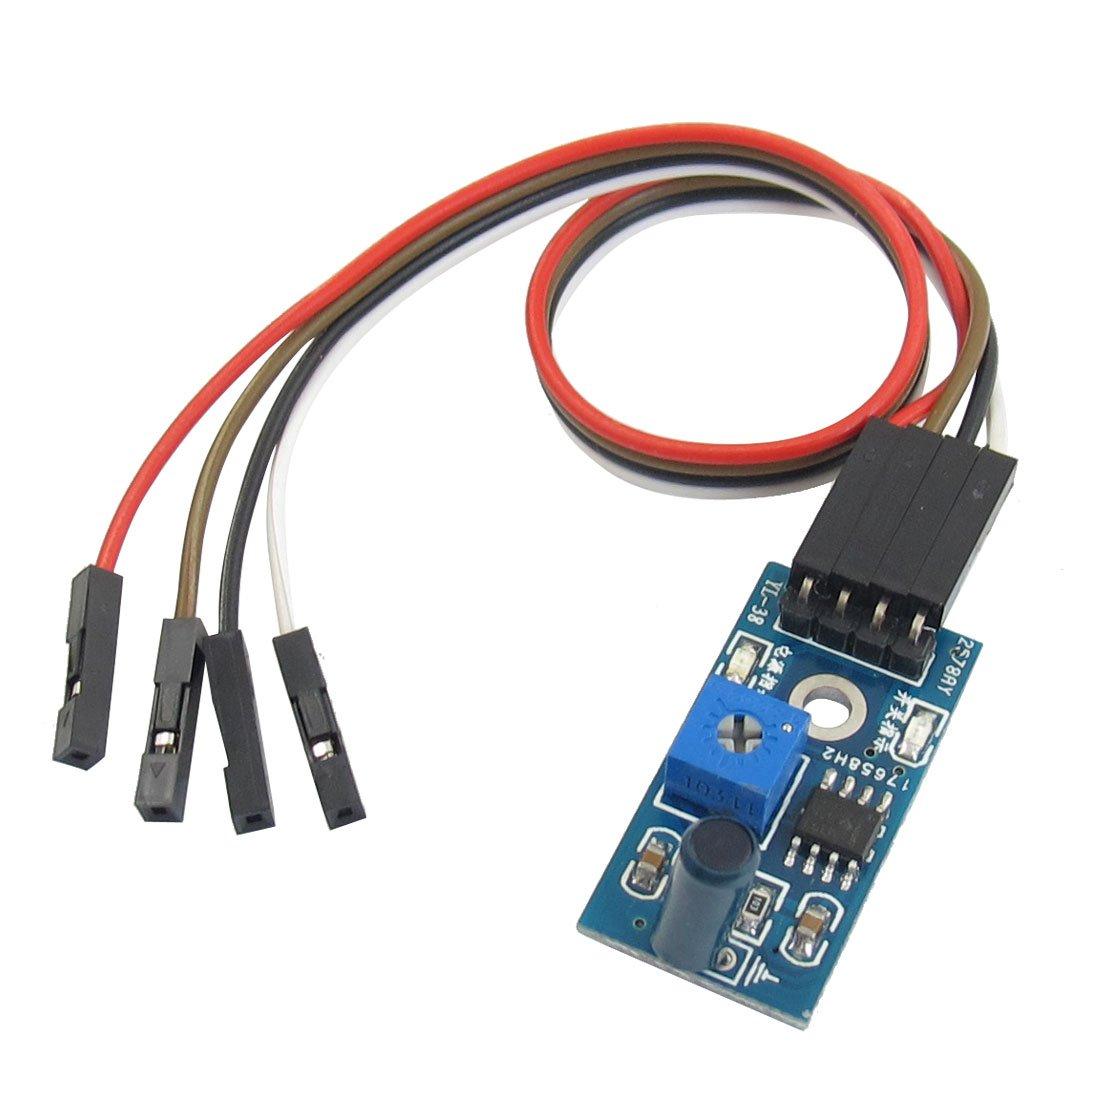 Uxcell 1-Channel 4 Pins Vibration Sensor Module for Intelligent Car 3.3-5V